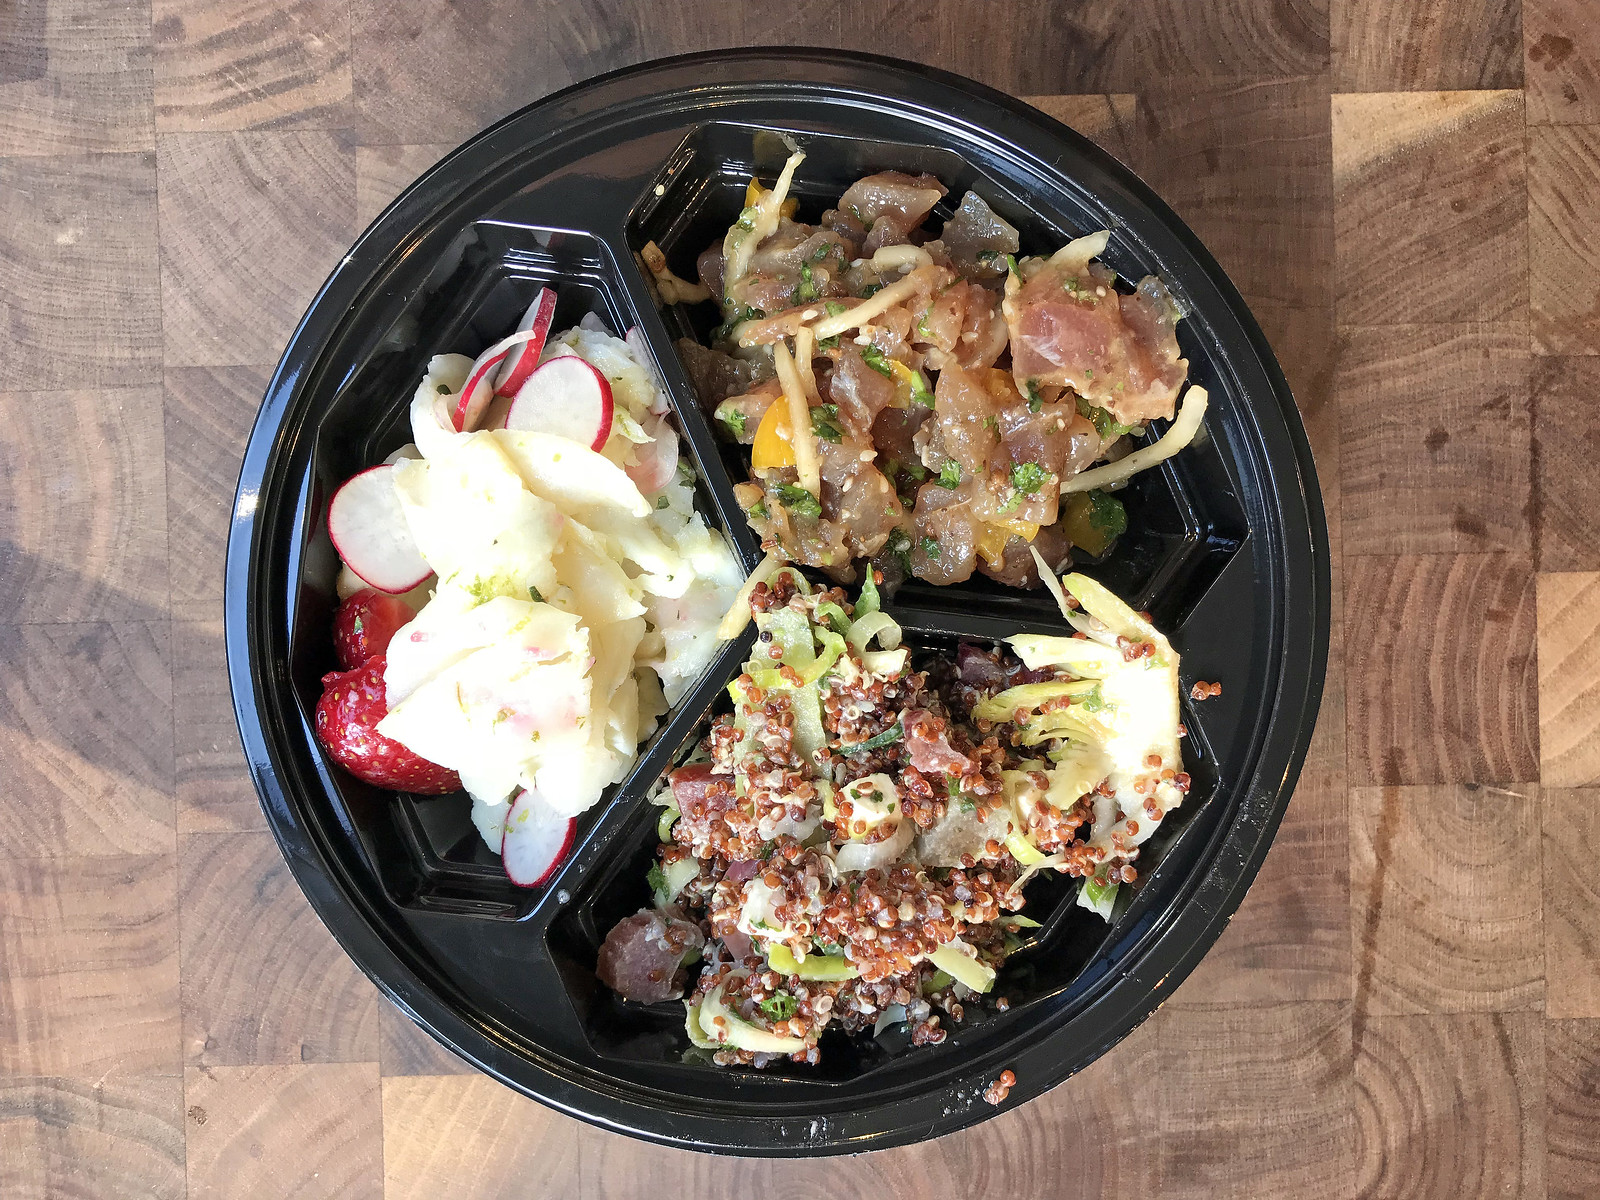 Hellefiskceviche, tuntatar, and quinoa salad at Hav Torvehallerne